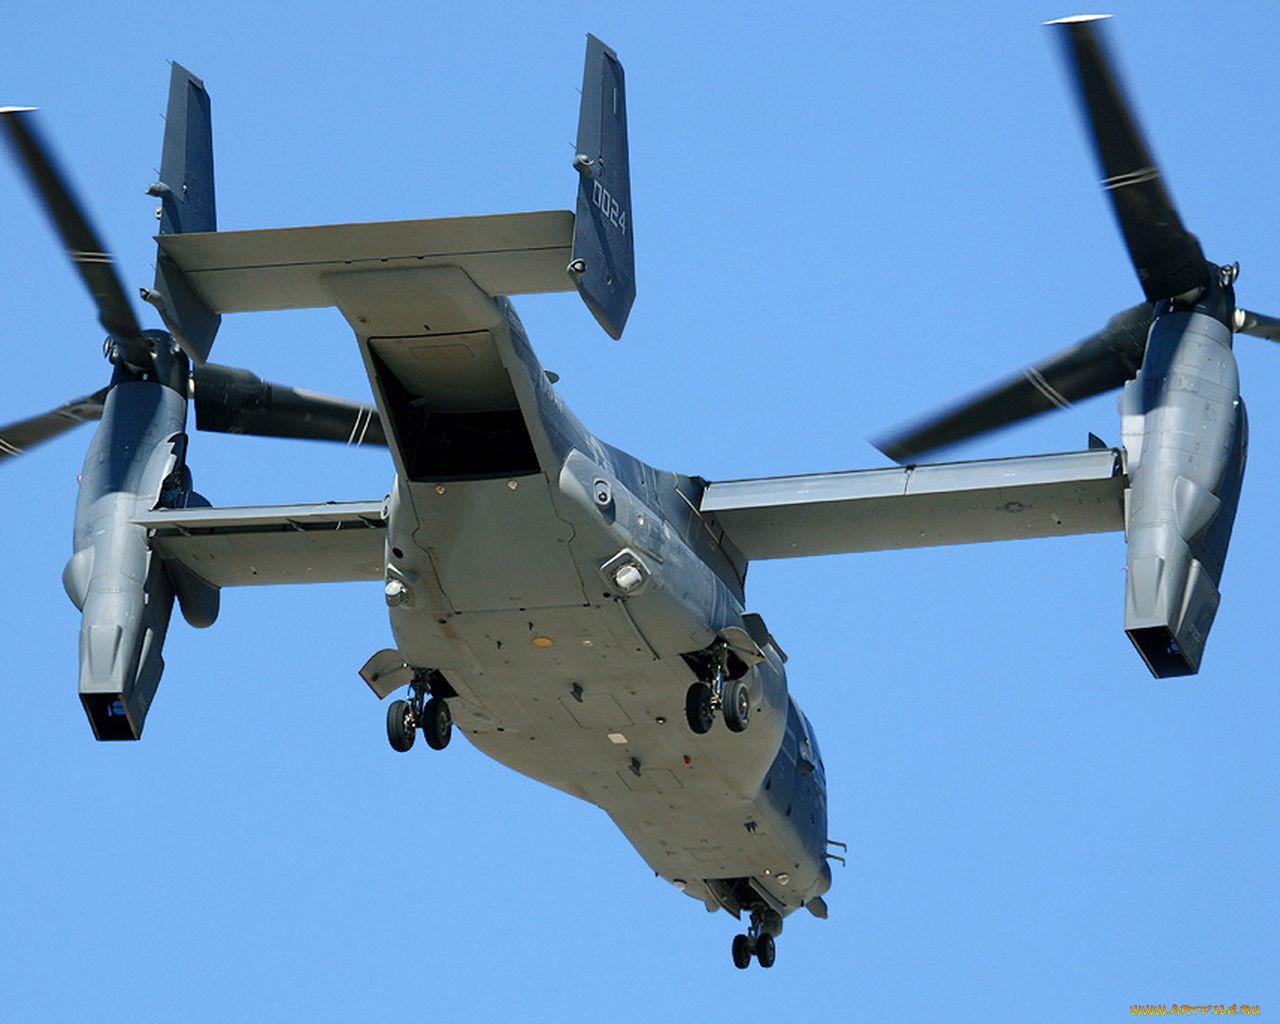 Конвертоплана bell v 22 osprey фото